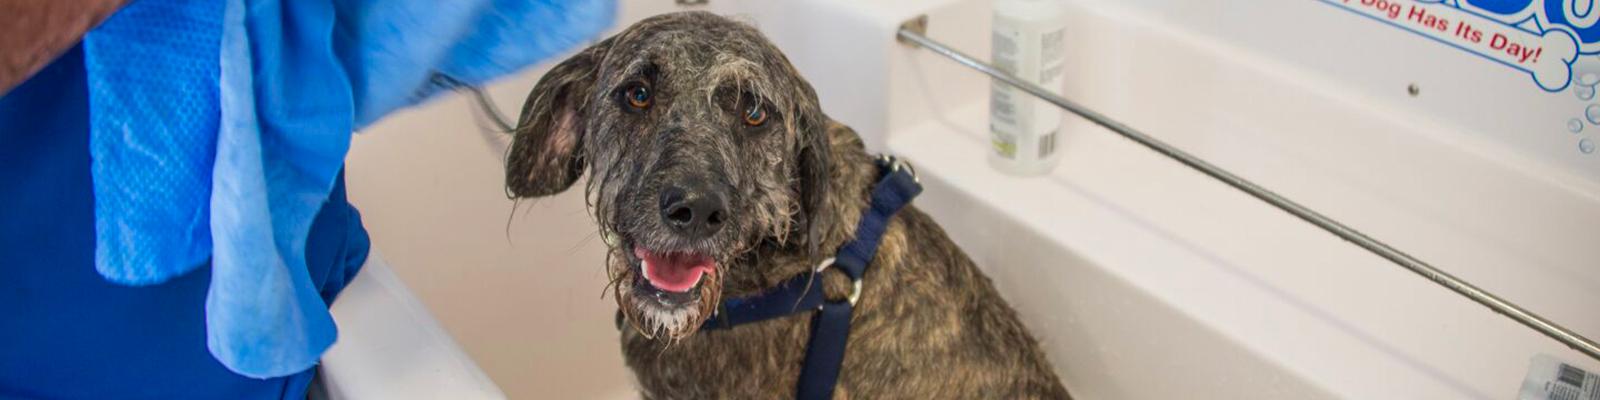 Hydrodog Dog Mobile Grooming Hero Image